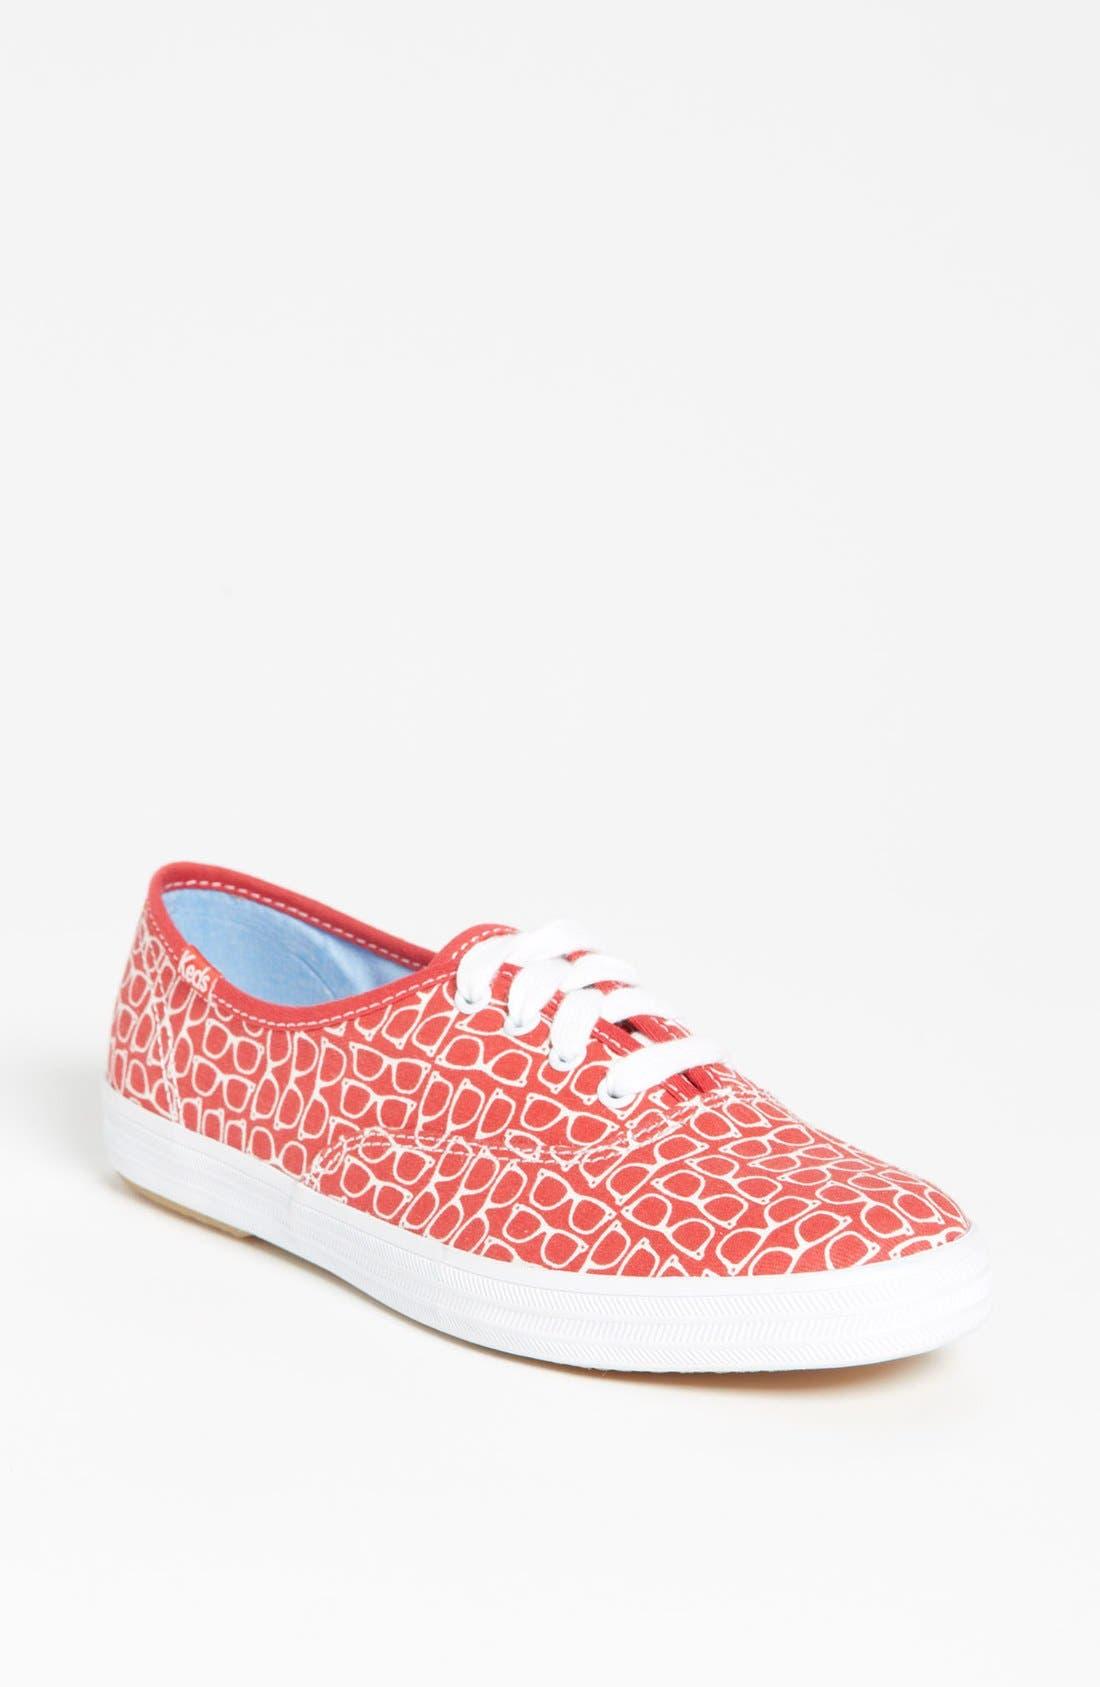 Taylor Swift Champion Sneaker,                             Main thumbnail 1, color,                             600